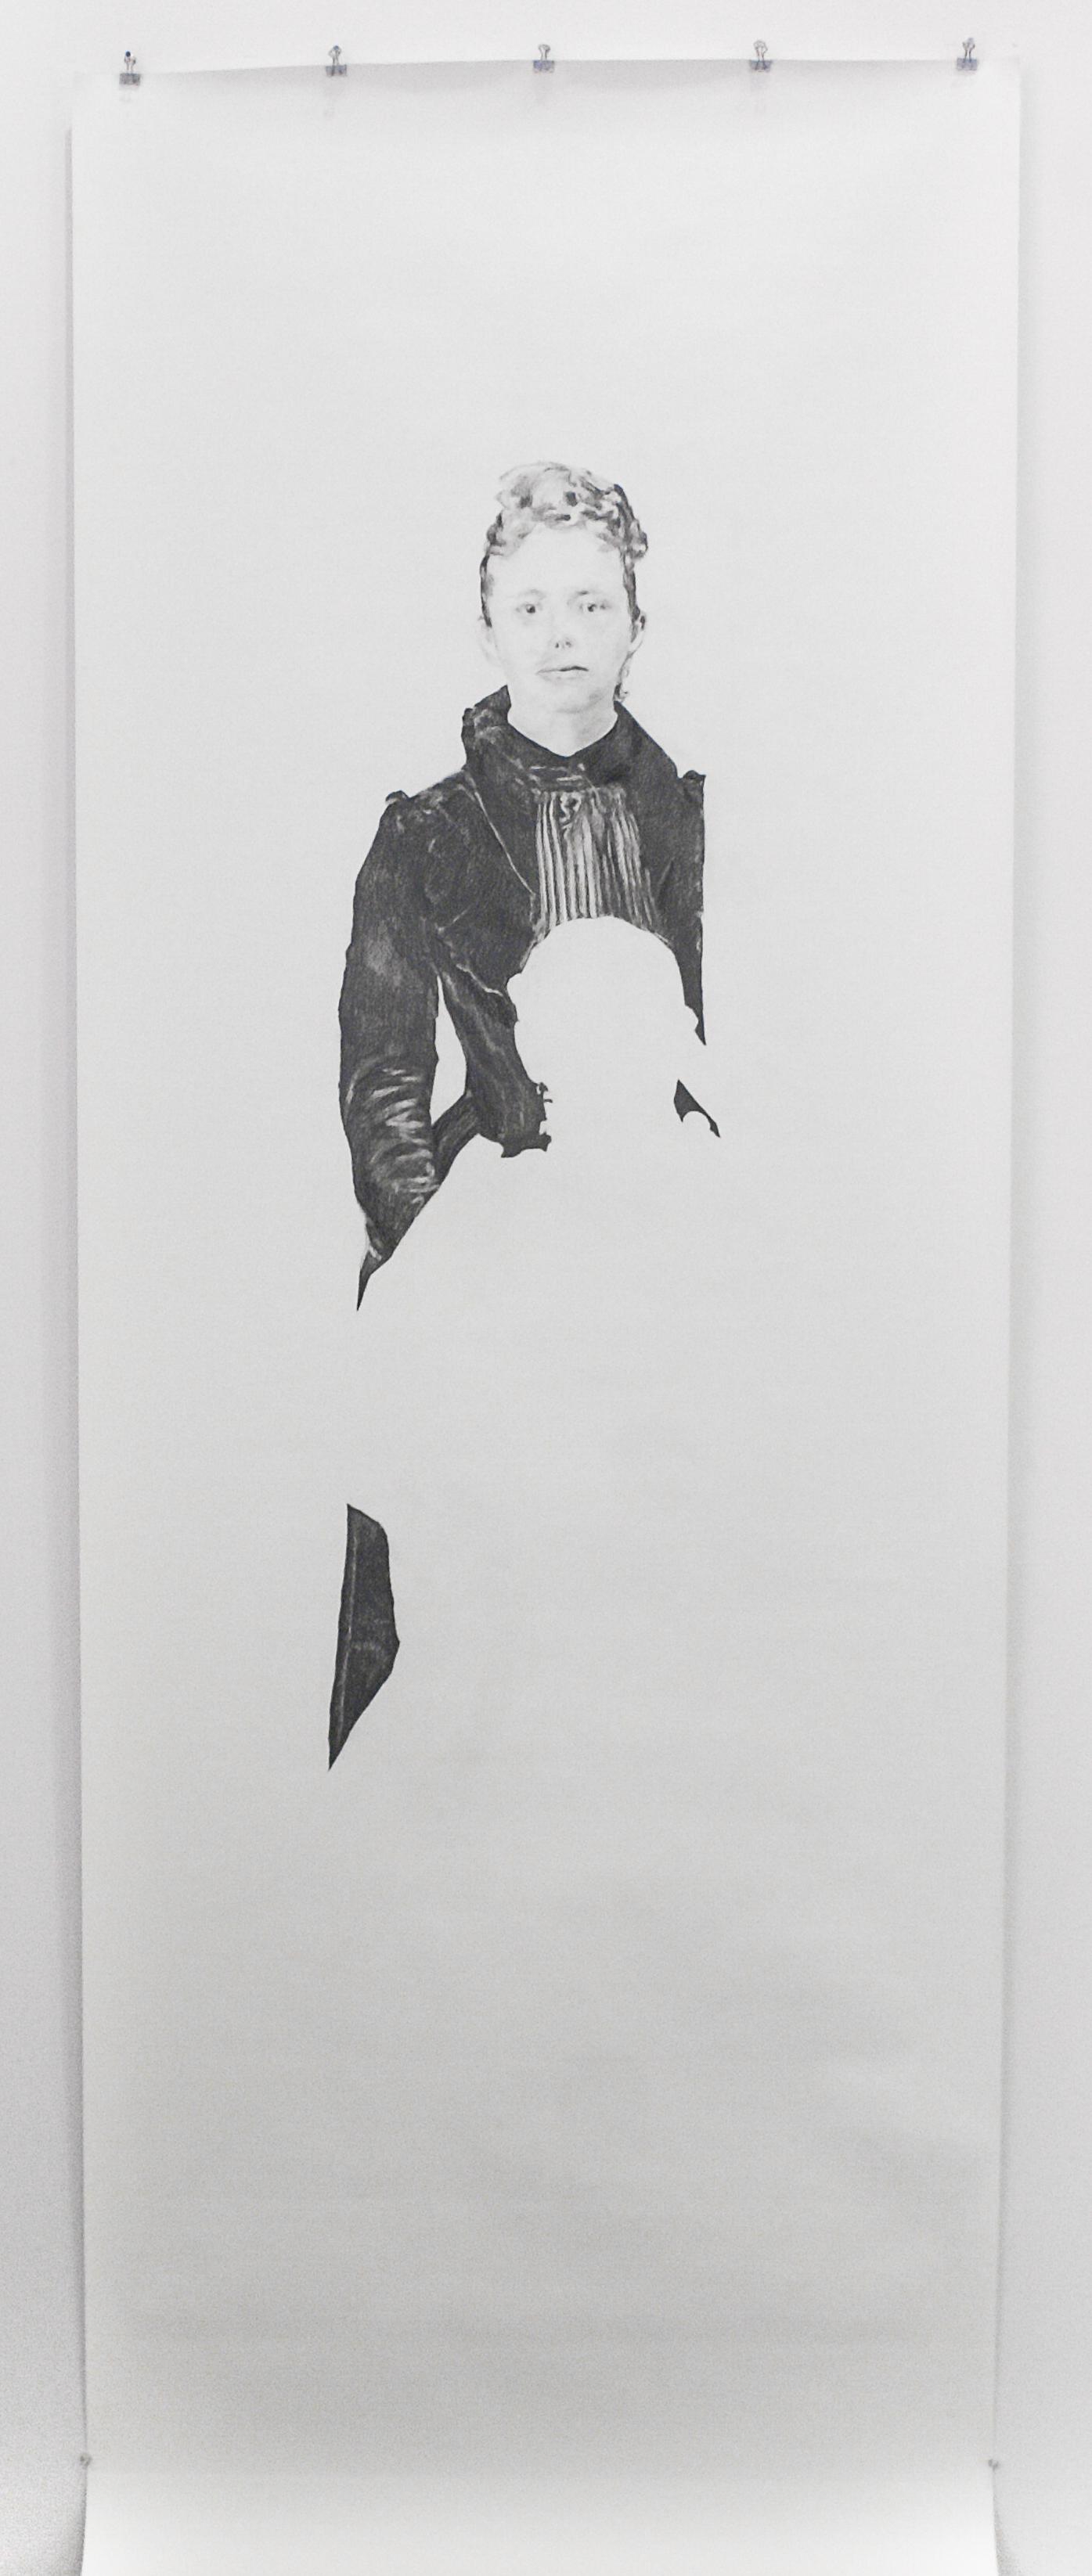 "Visual Heritage, 2012   Etta, graphite on paper scroll   84"" x 36"""